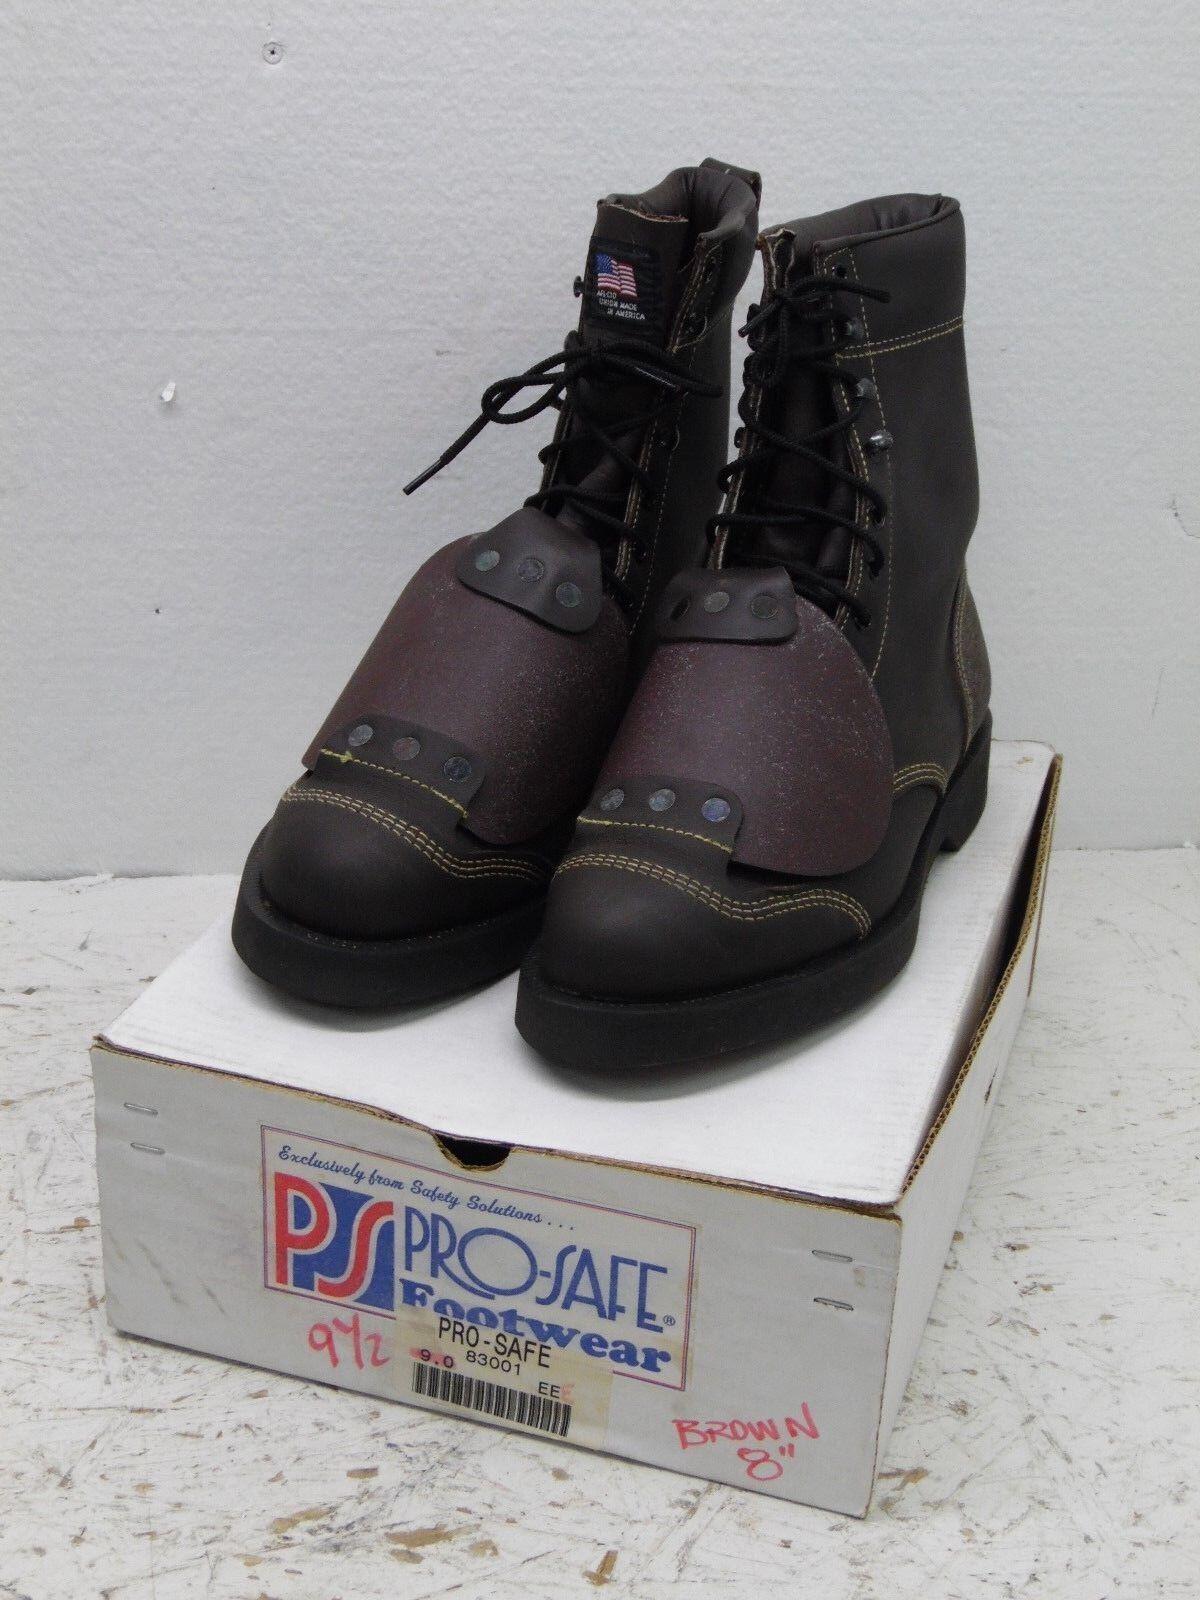 colorways incredibili Vintage nos pro-safe 9.5 EEE work work work stivali steel toe with toe flap leather Marrone  ordina ora i prezzi più bassi